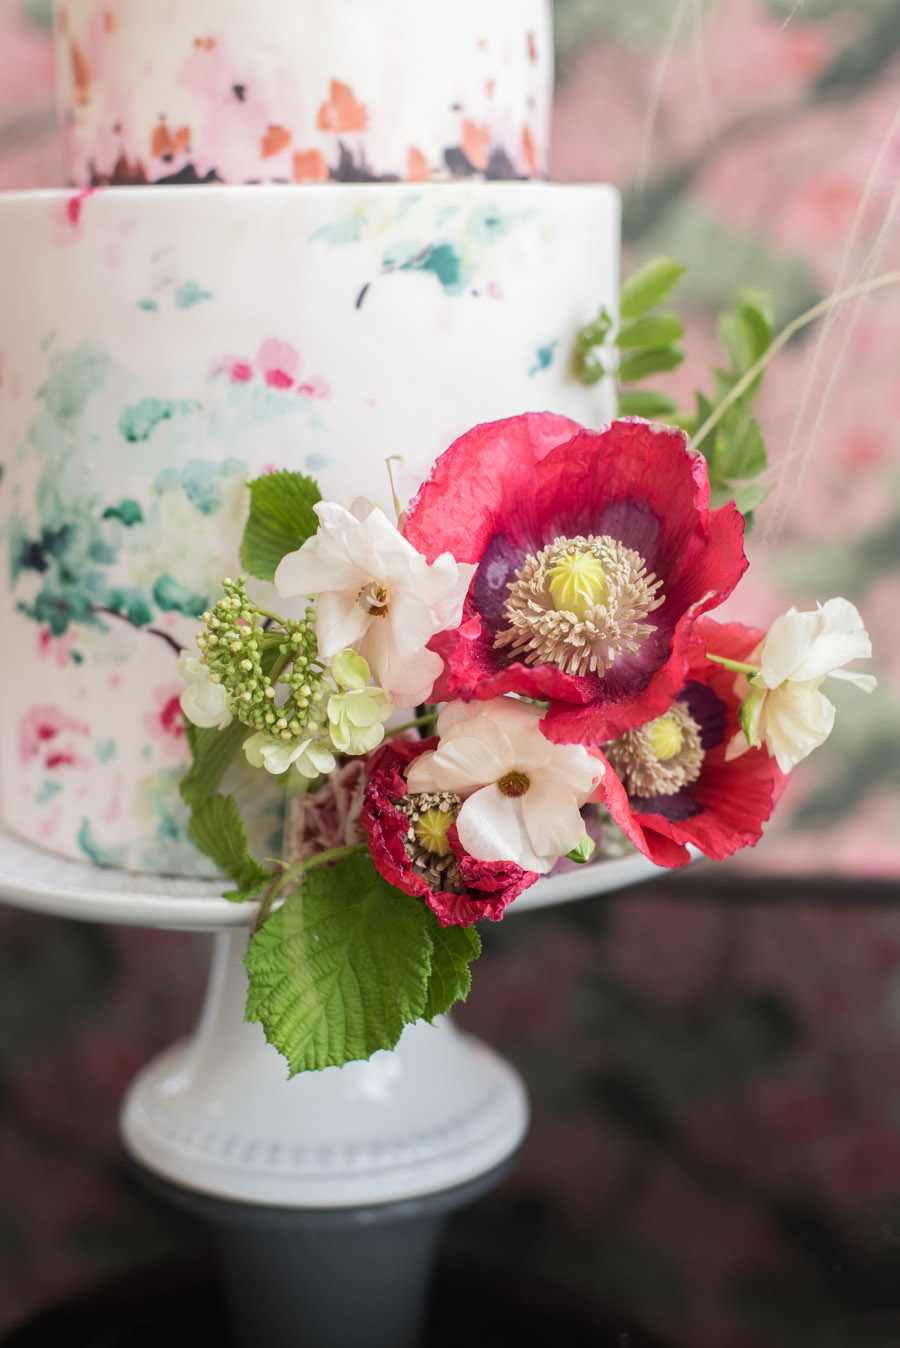 floral wedding ideas at Millbridge Court on English Wedding - photo credit Julie Michaelsen Photography (29)